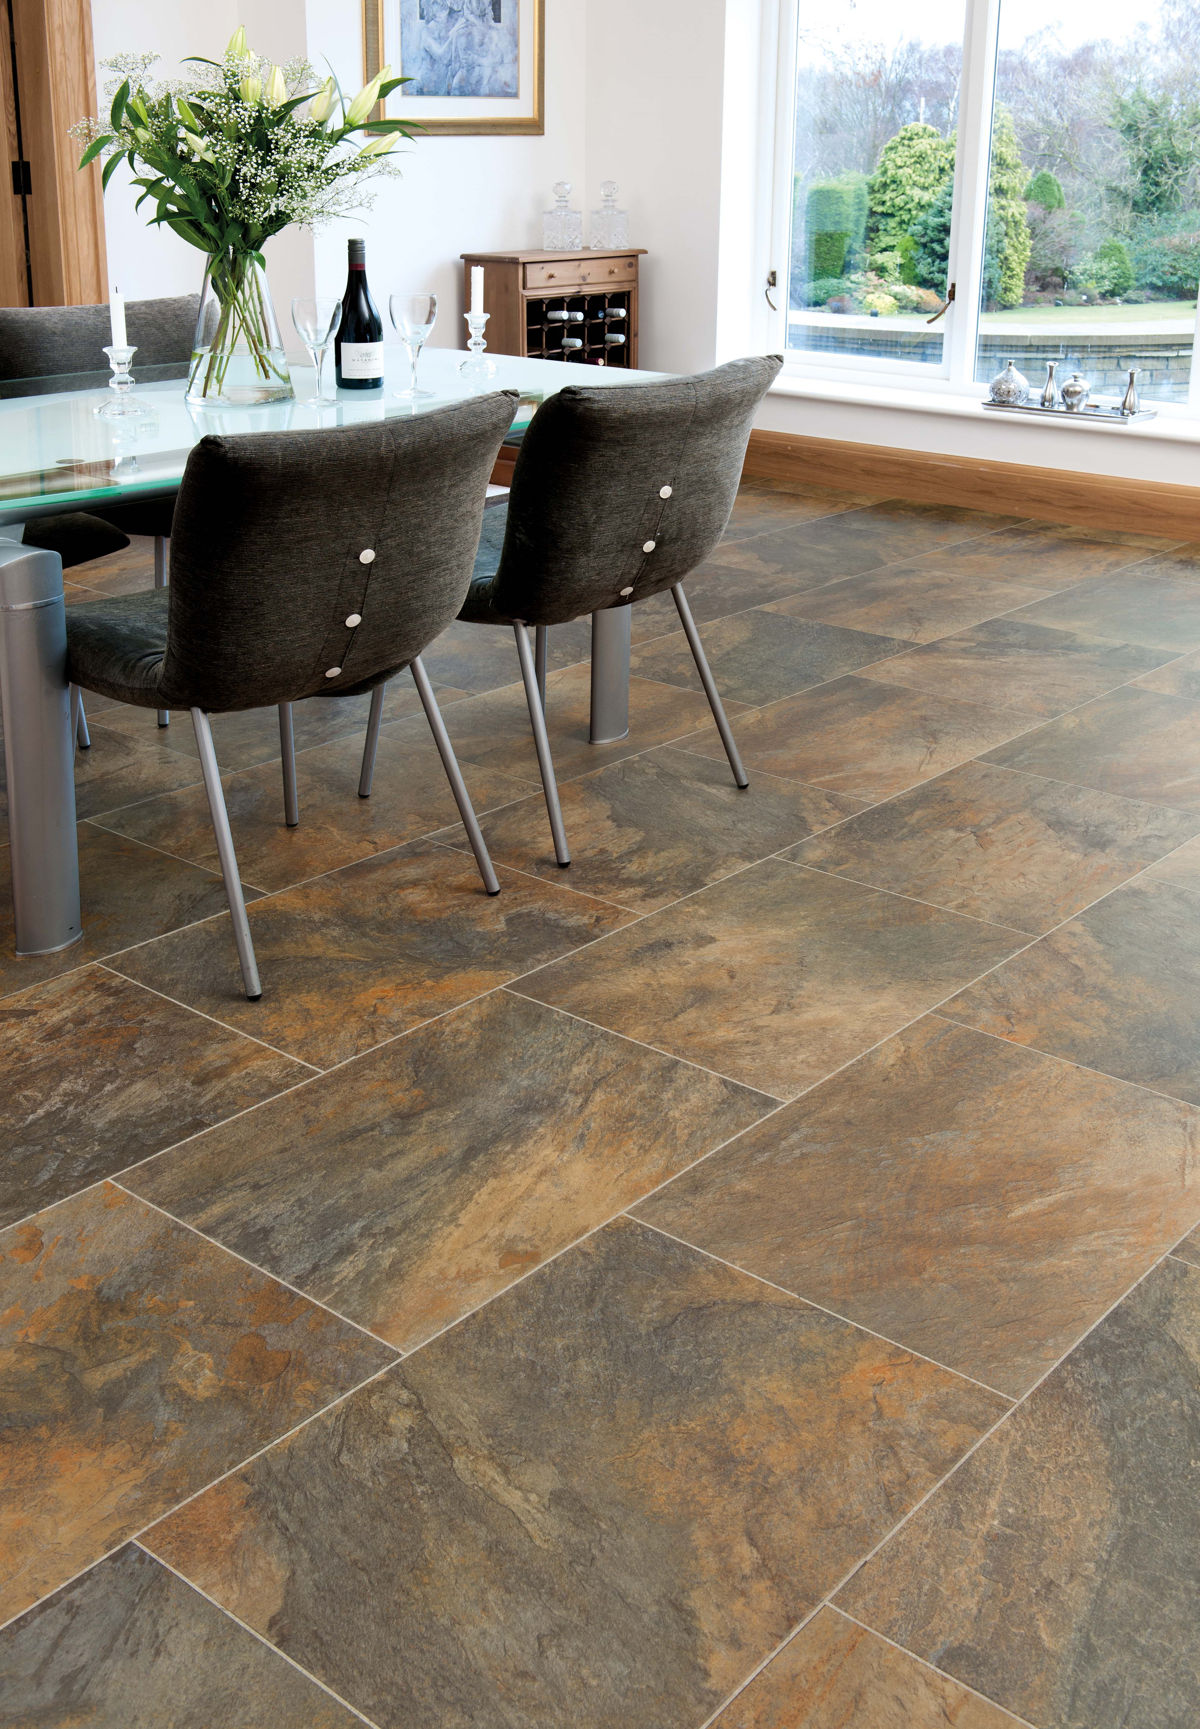 Art select melbourne lm05 vinyl flooring karndean art select melbourne lm05 vinyl flooring dailygadgetfo Choice Image